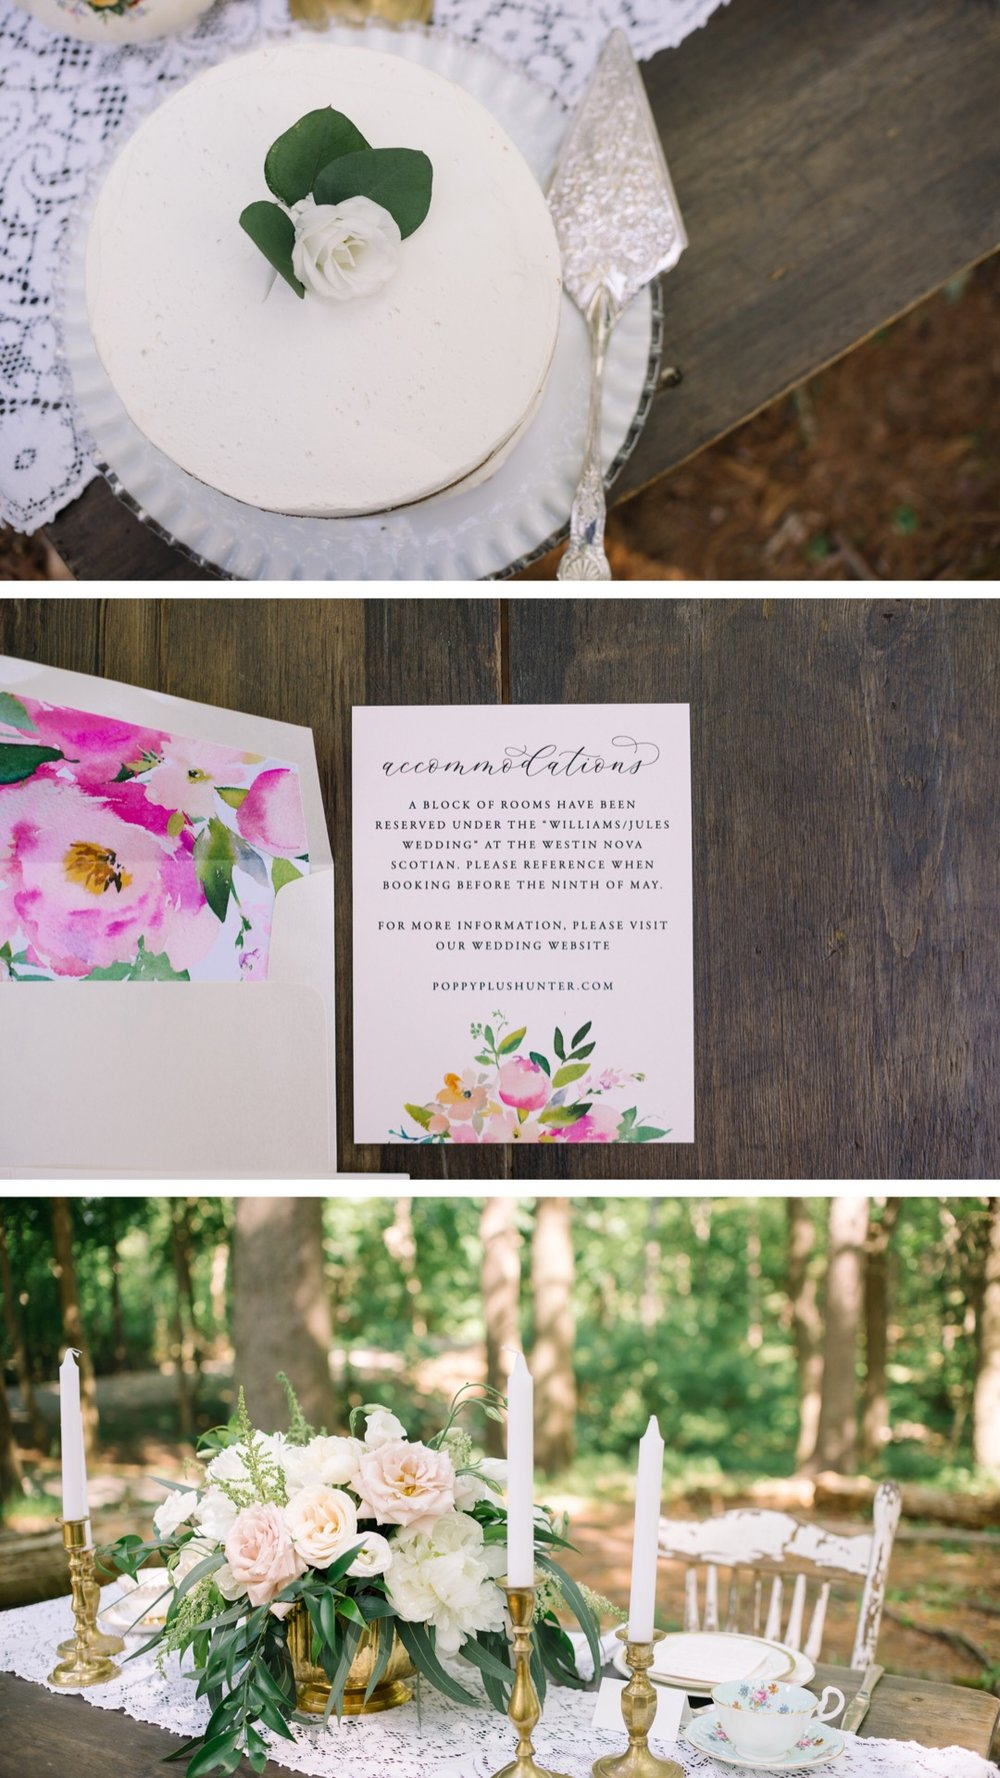 Halifax Wedding Photographer Styled Shoot - Gray Weddings & Events - Sinead Dubeau Photography 03